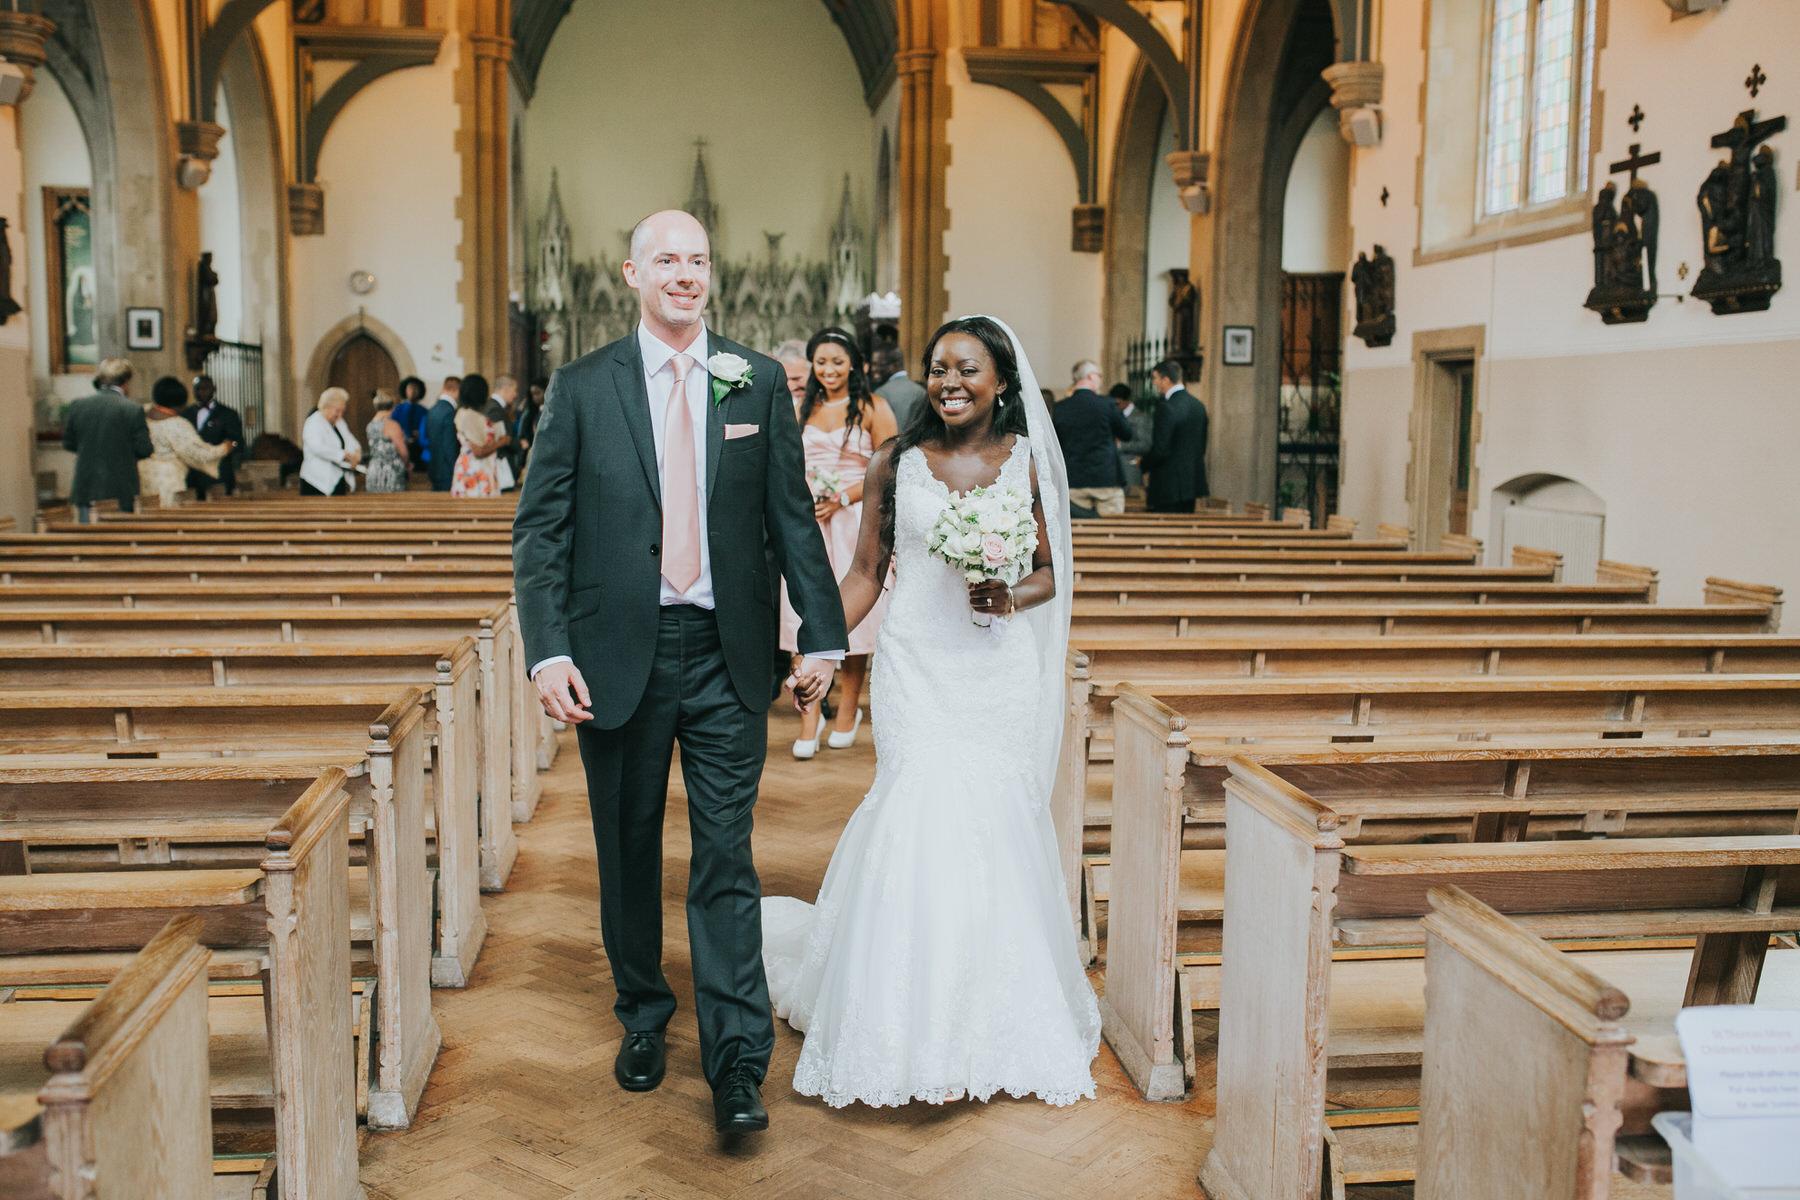 89 bride and groom leaving church hand in hand.jpg